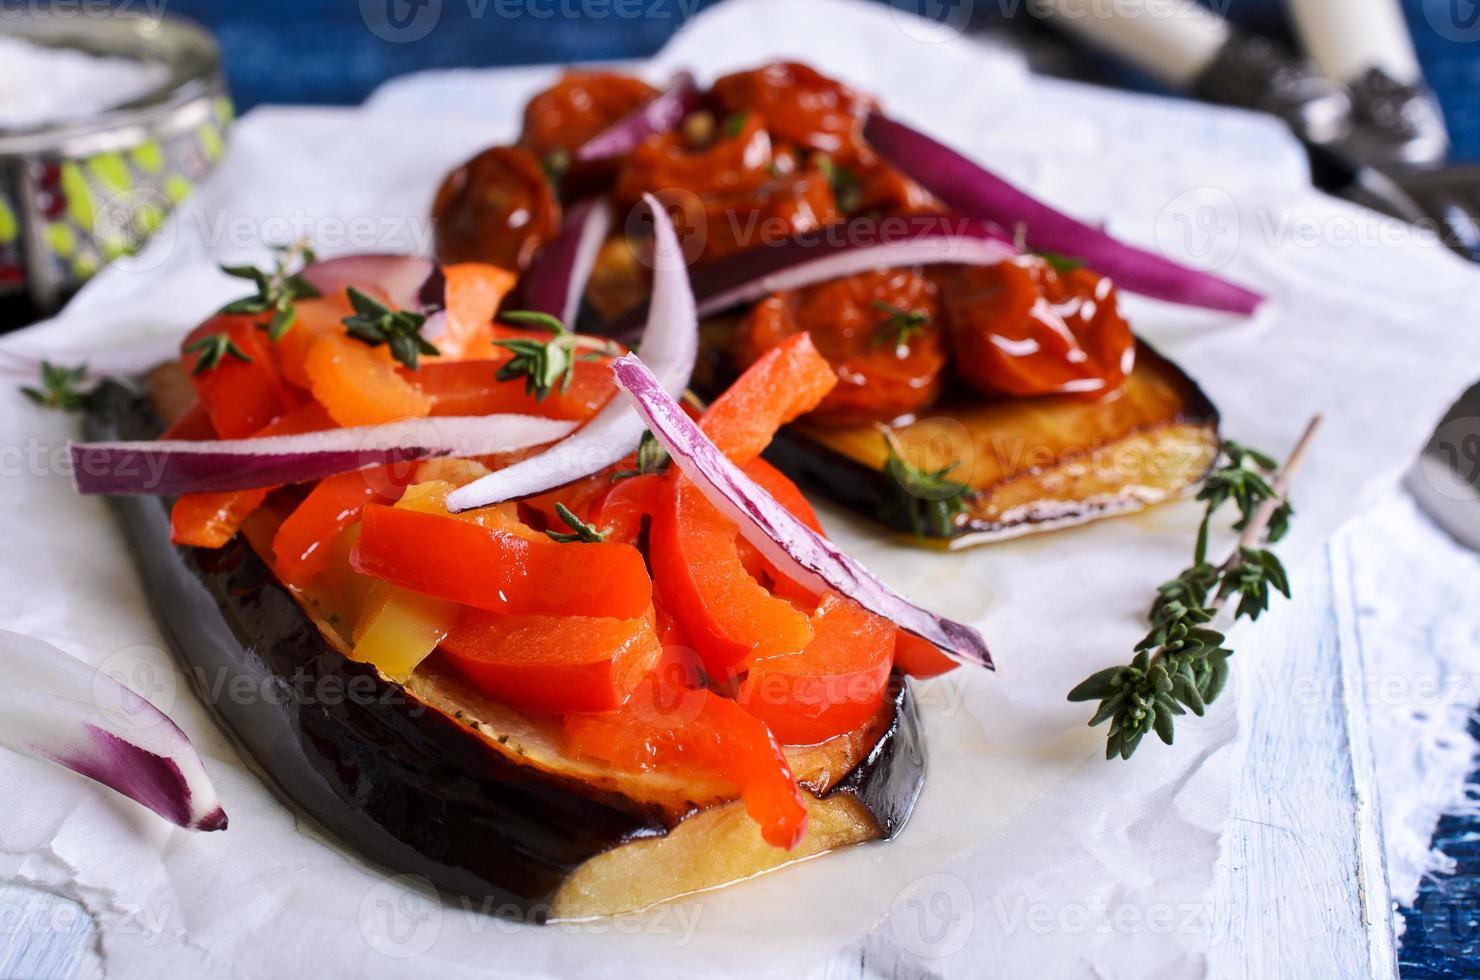 Eggplant with vegetables photo